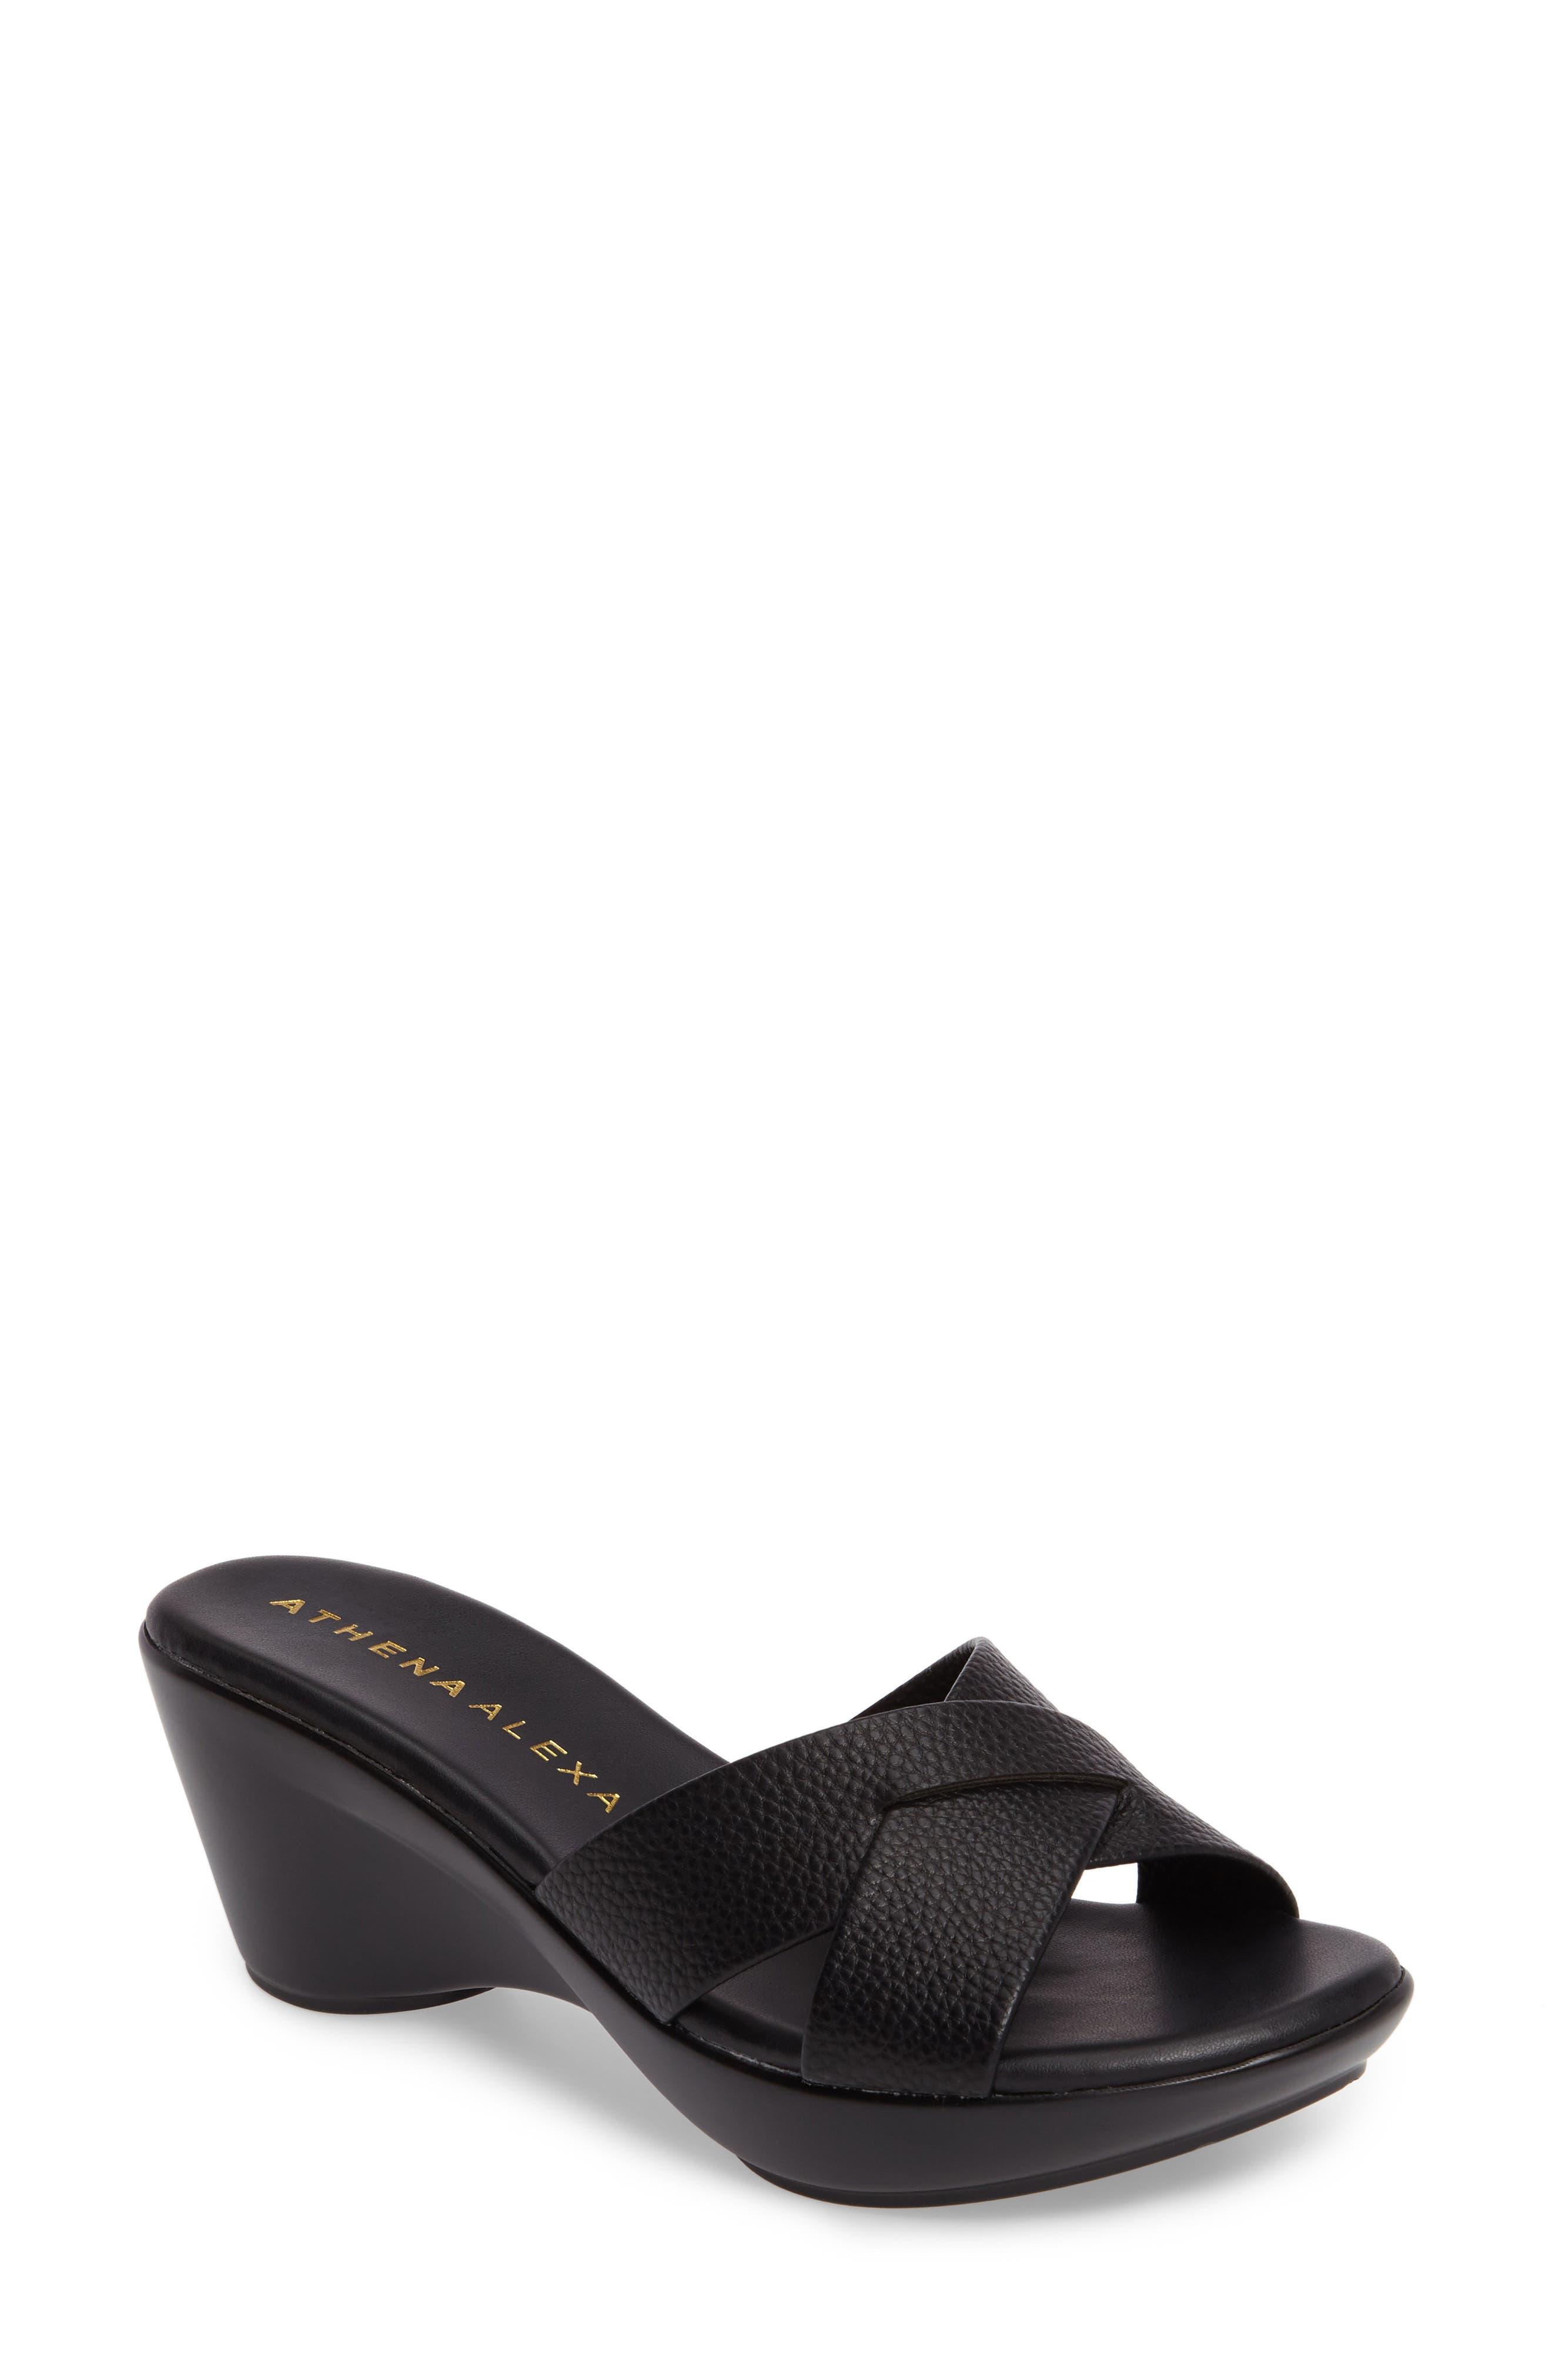 Verna Wedge Slide Sandal,                             Main thumbnail 1, color,                             001